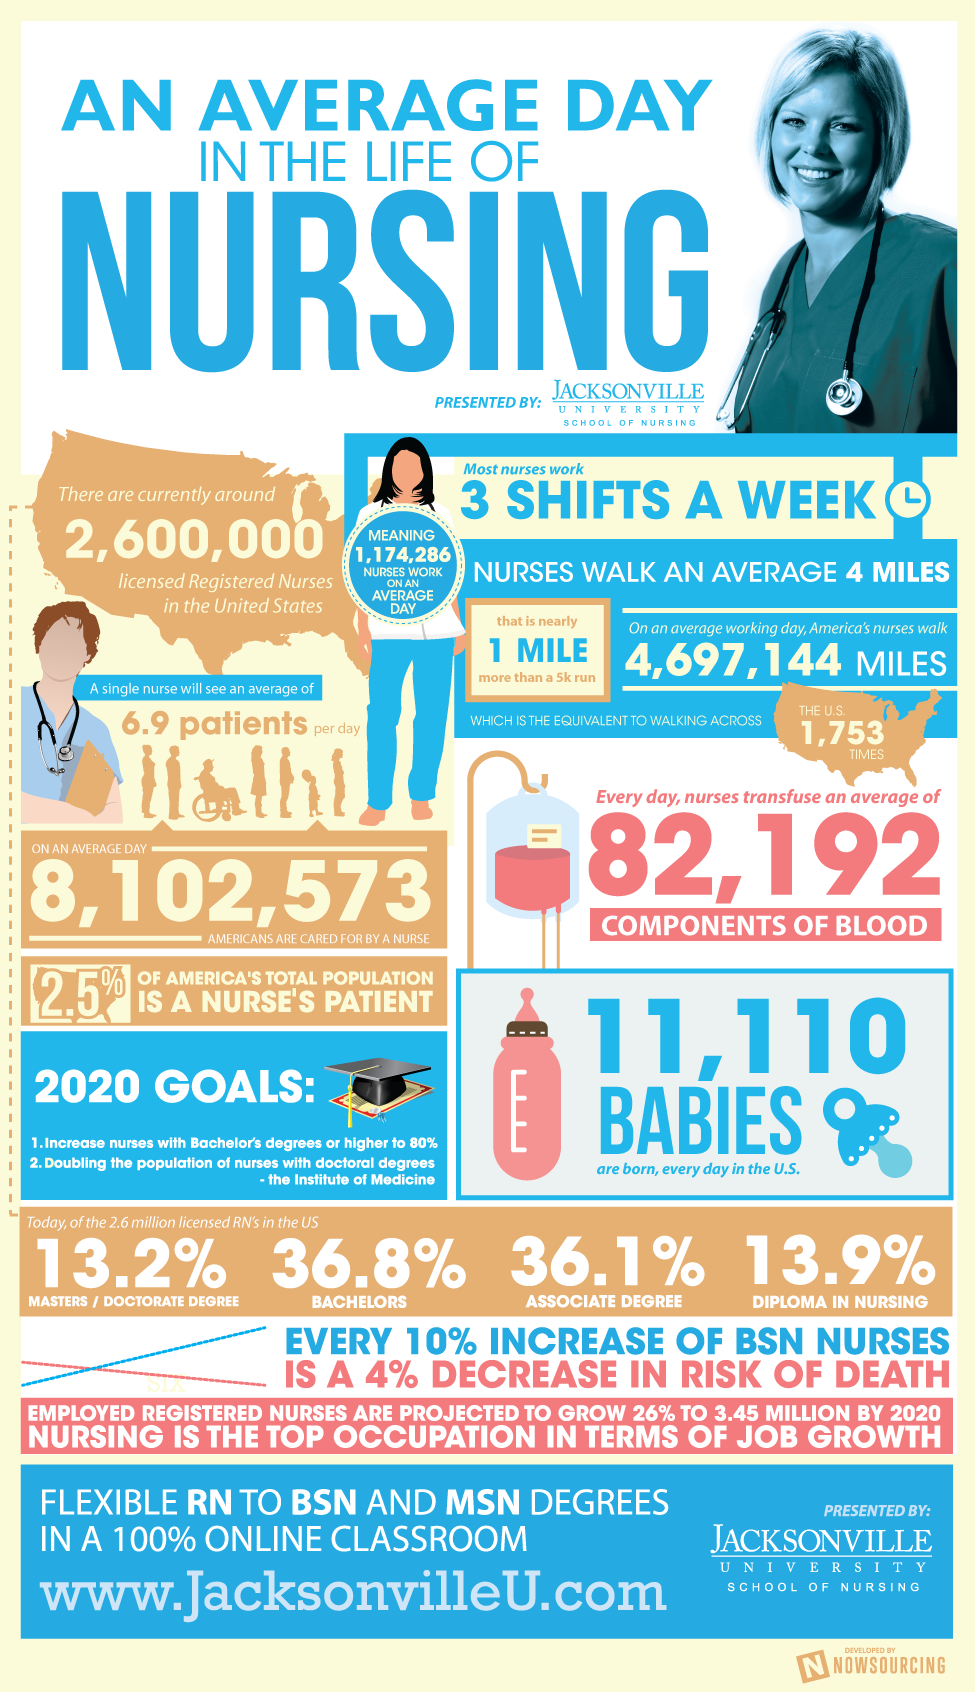 average-day-nursing-infographic